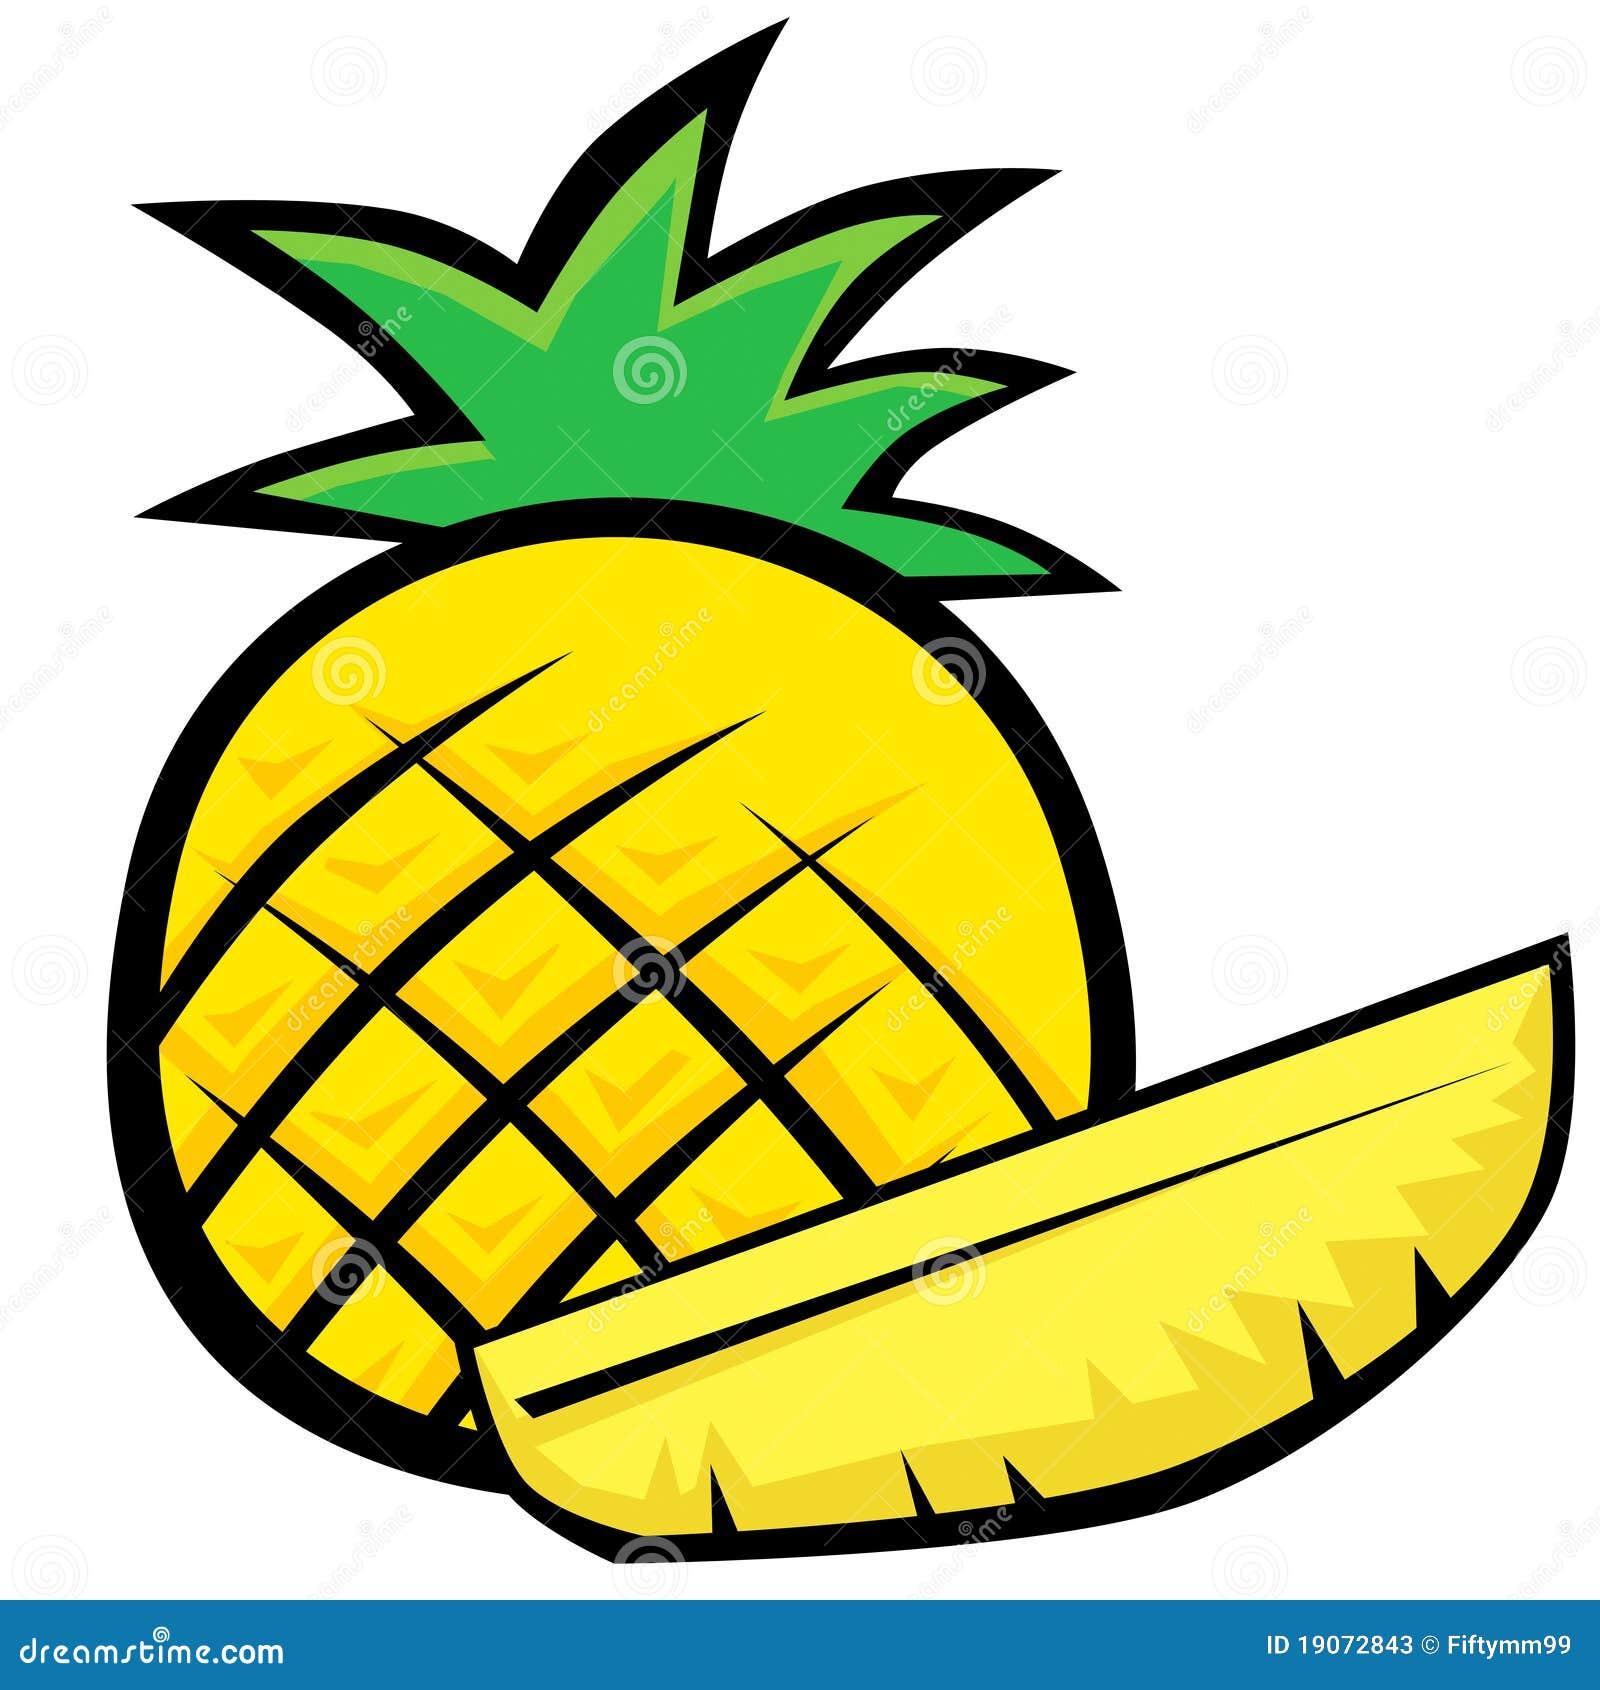 pineapple stock illustration illustration of food design 19072843 rh dreamstime com clipart pineapple outline clipart pineapple slice